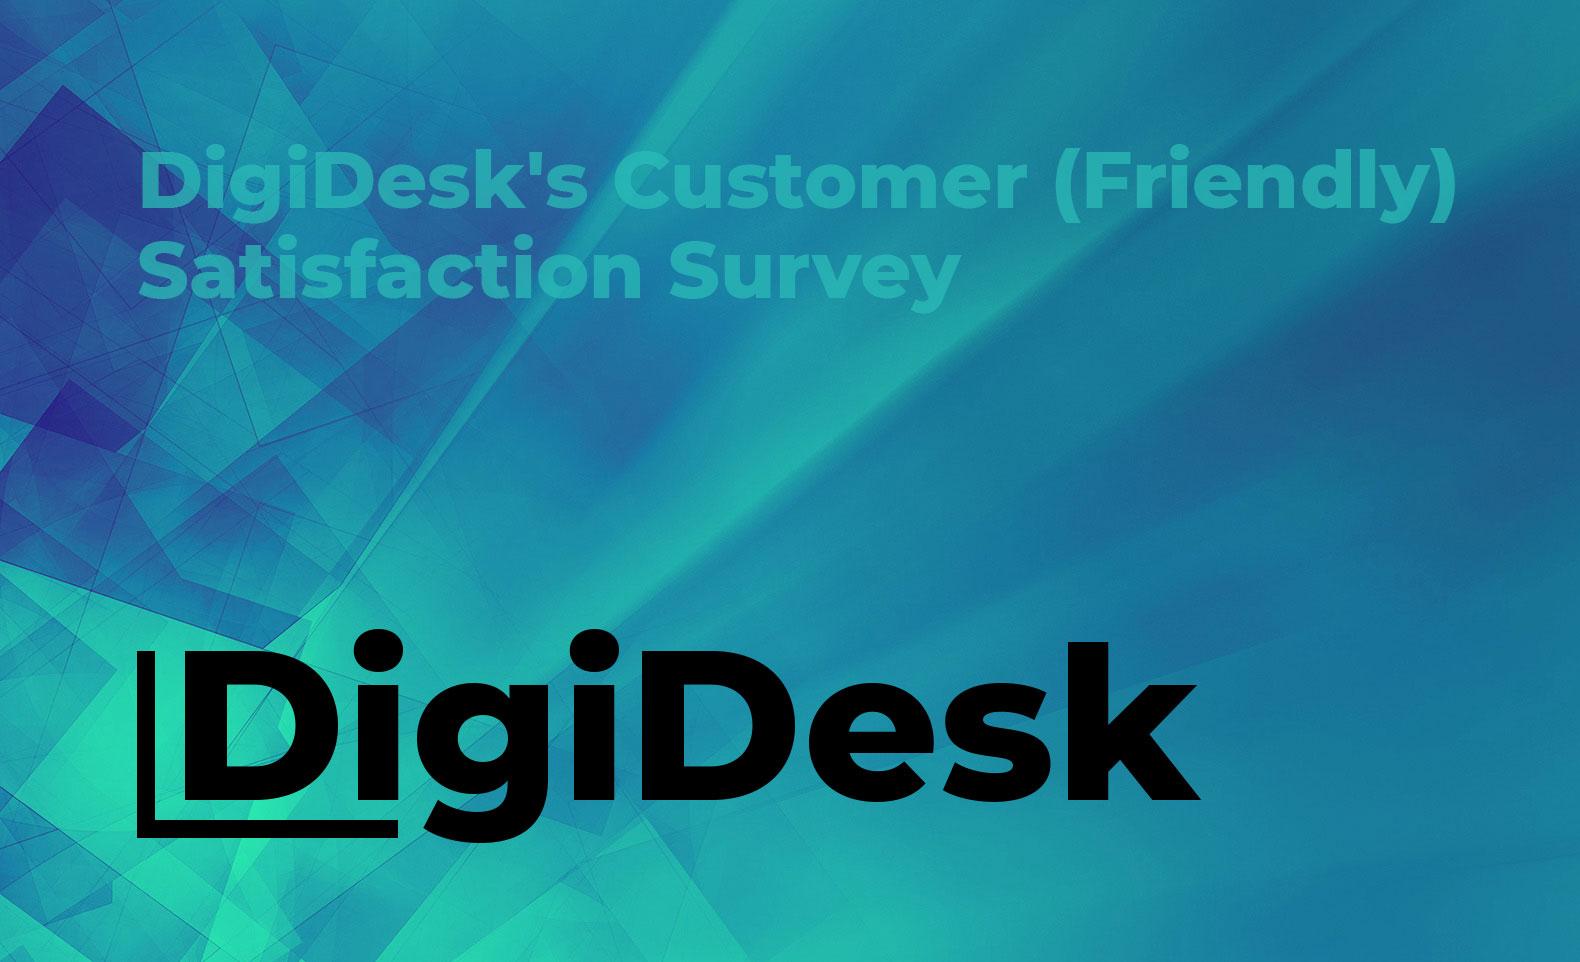 DigiDesk's Customer (Friendly) Satisfaction Survey